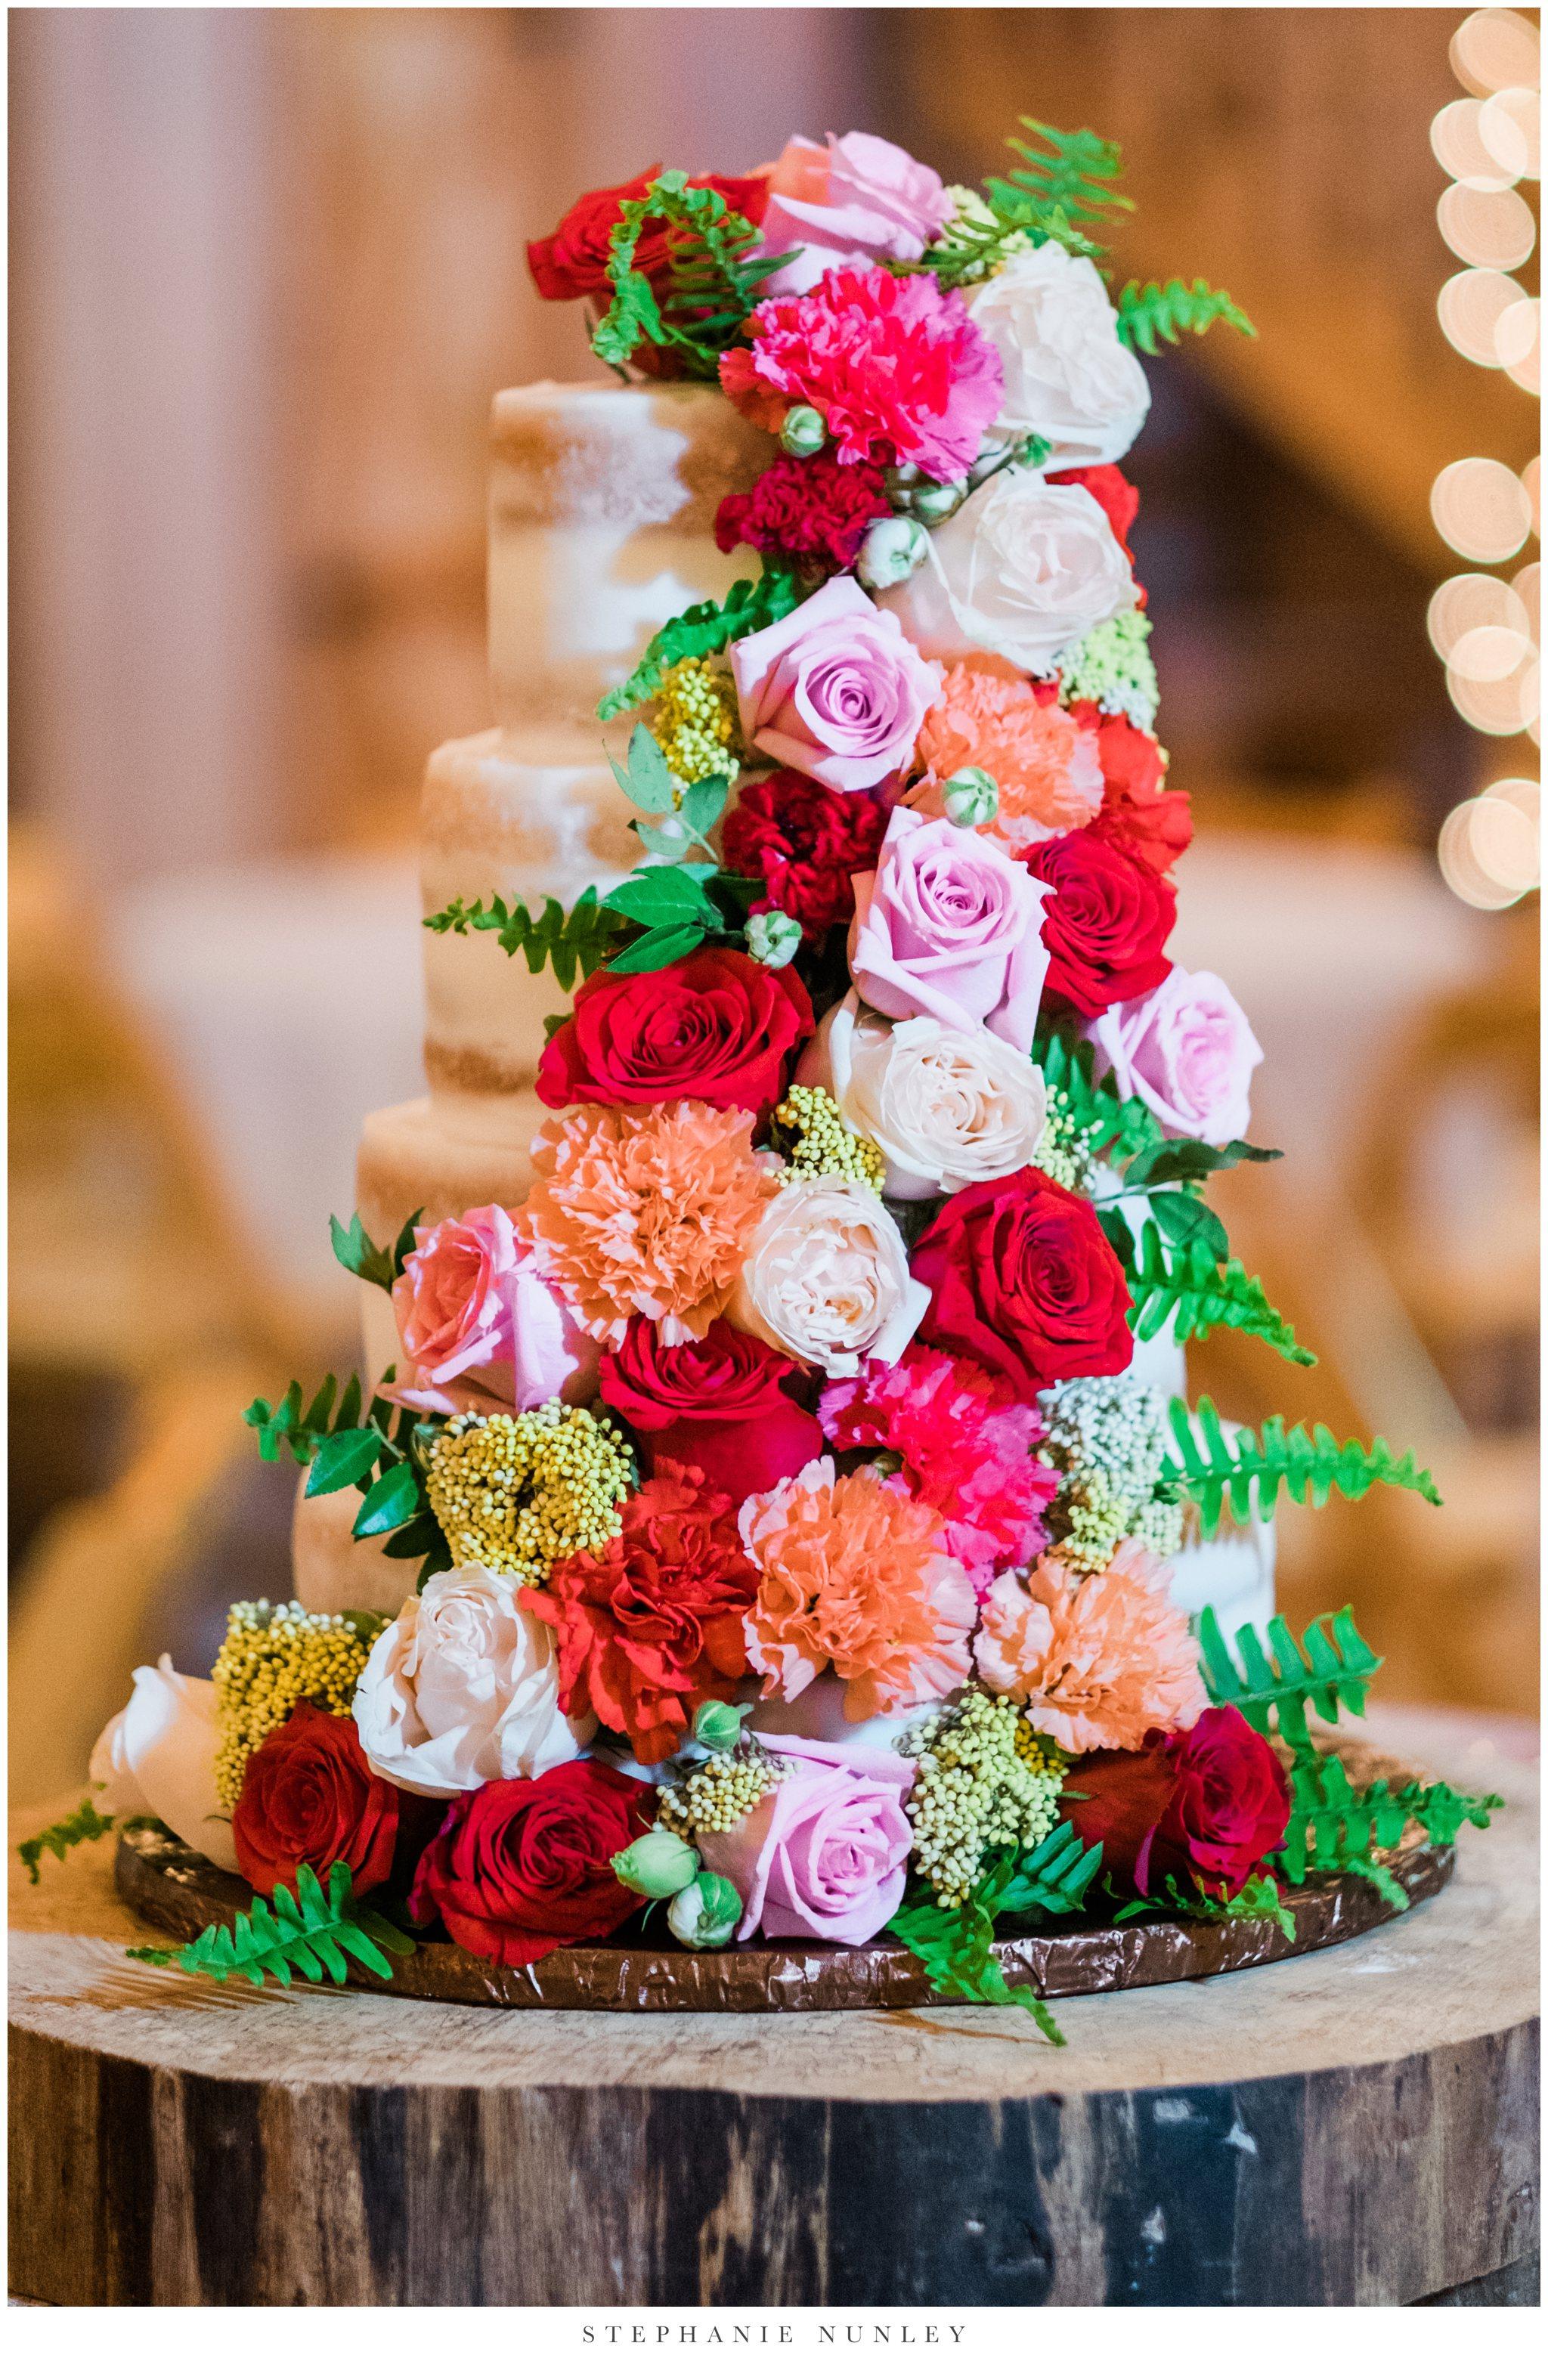 arkansas-wedding-with-lush-wildflower-bouquet-0111.jpg